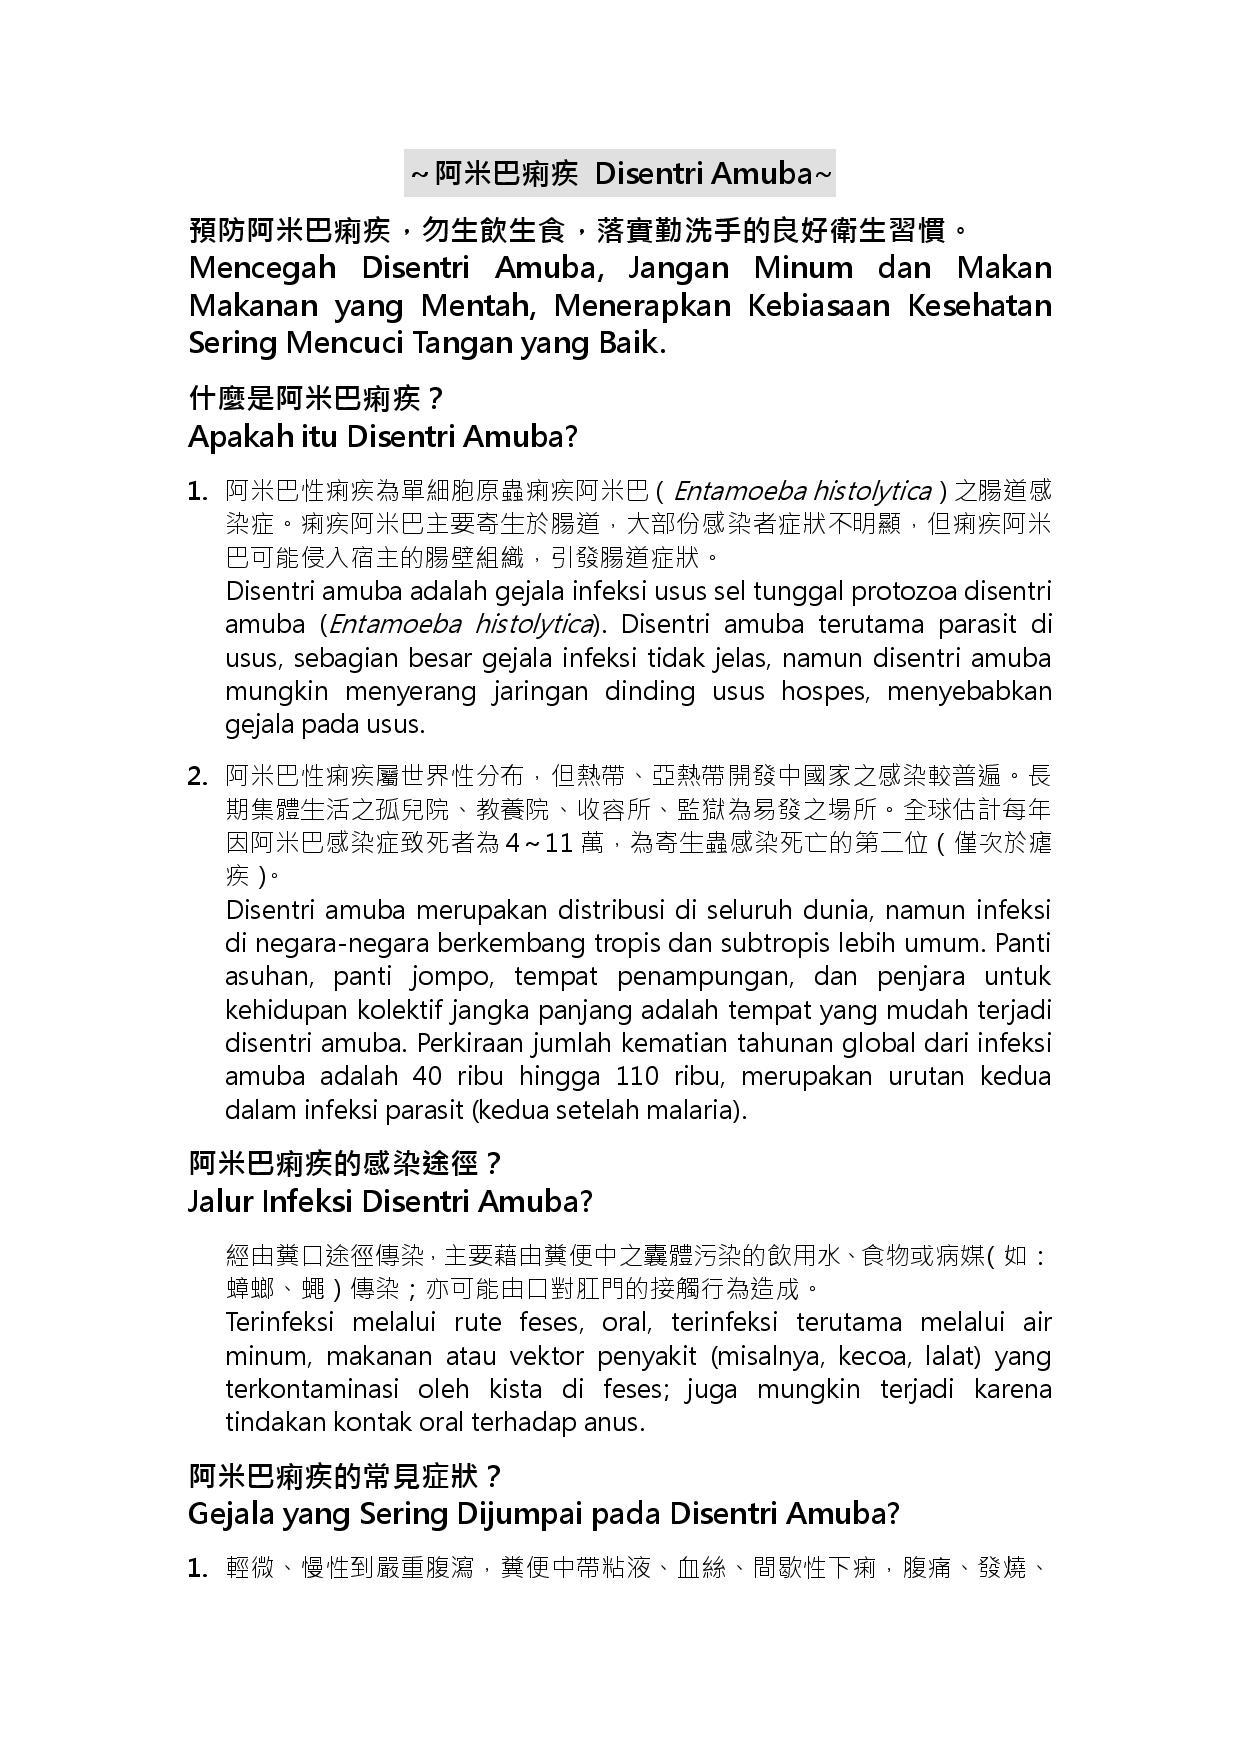 詳如附件【Klik】Mencegah Disentri Amuba(Halaman 1)預防阿米巴痢疾(印尼文)